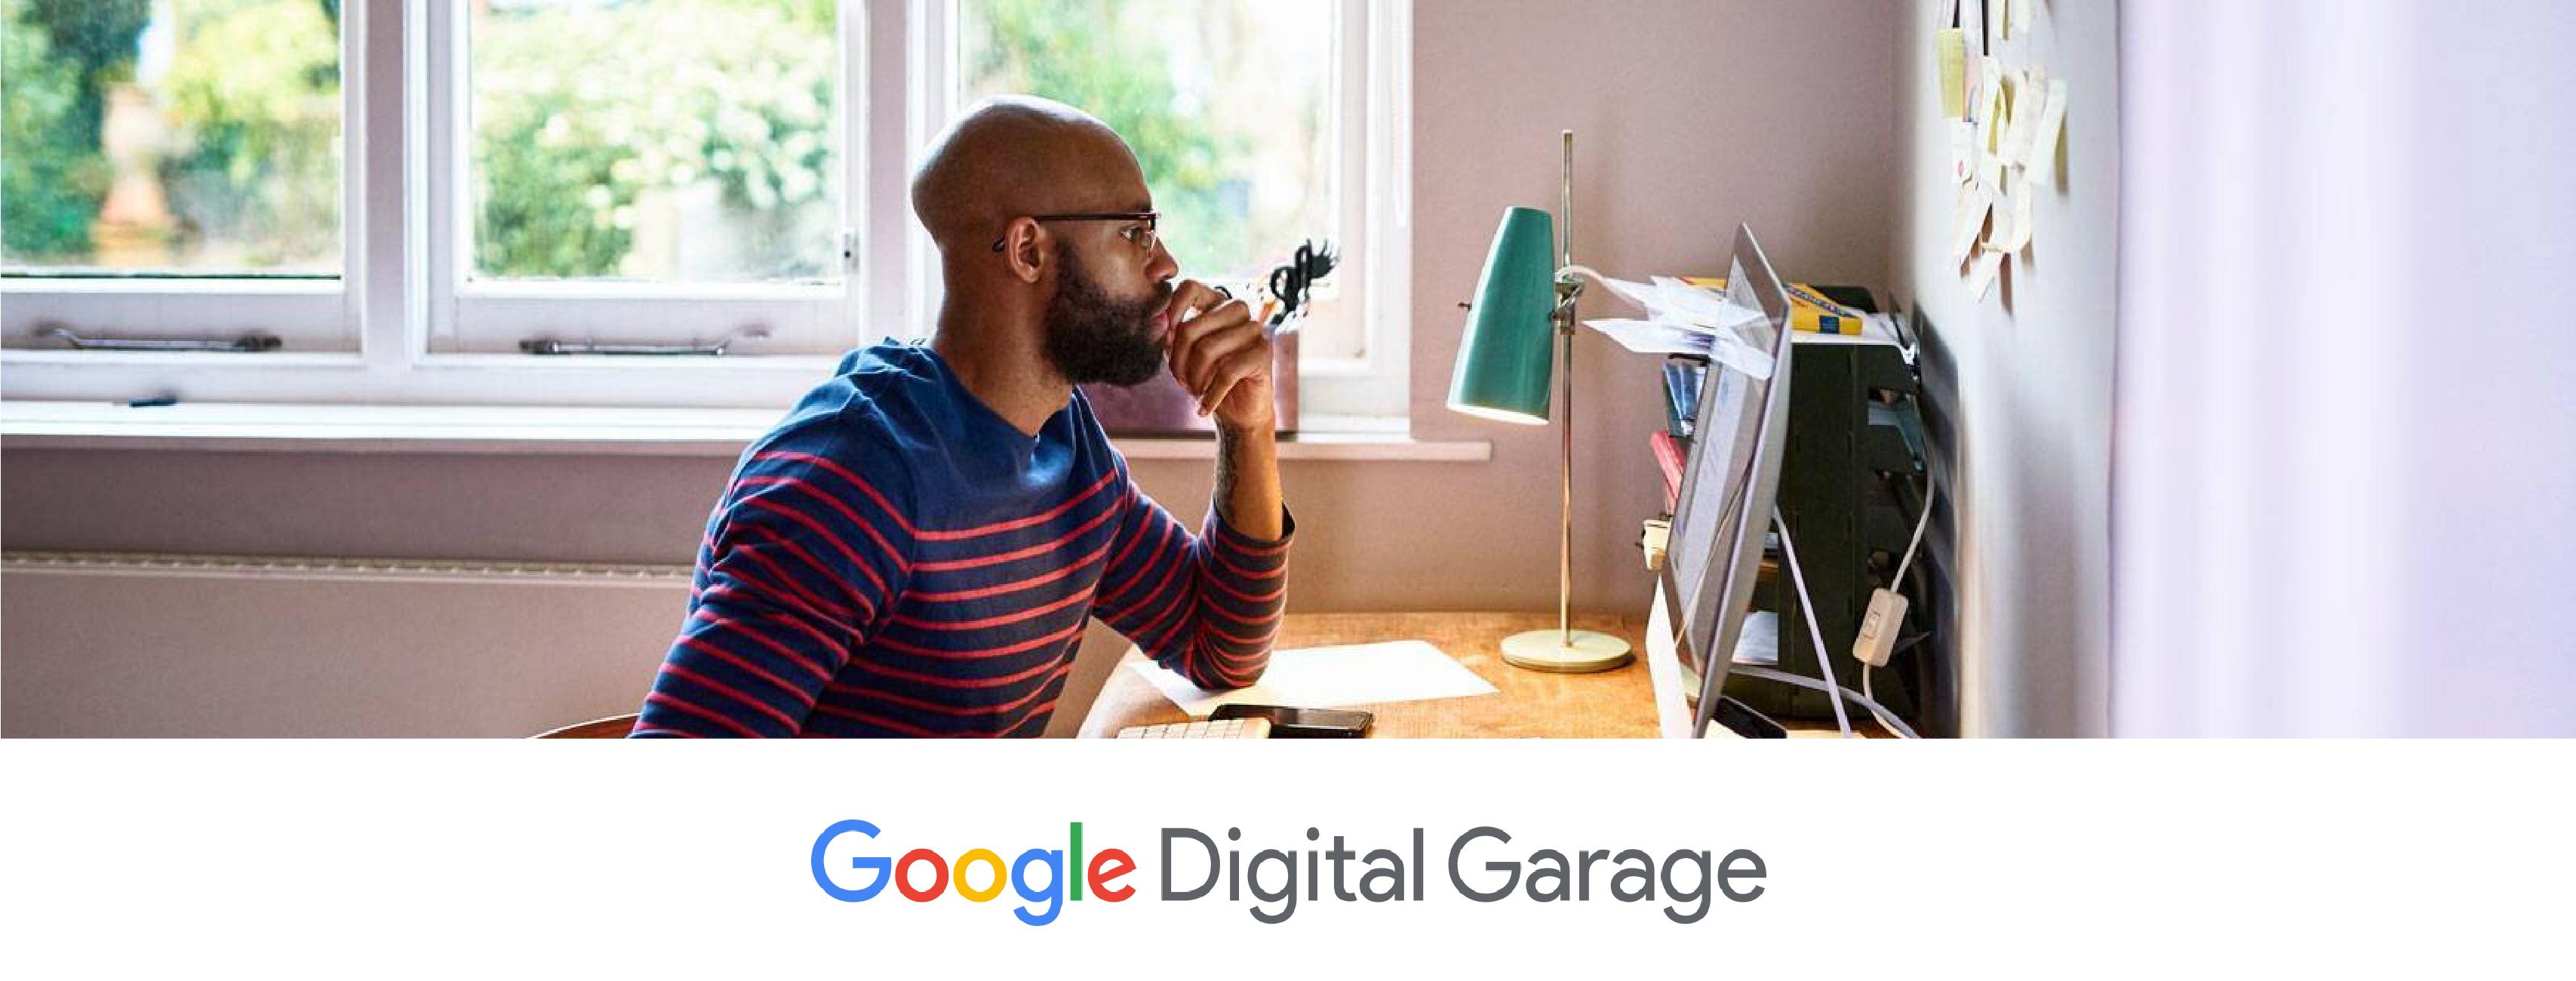 02/25/2021 - Google Digital Garage